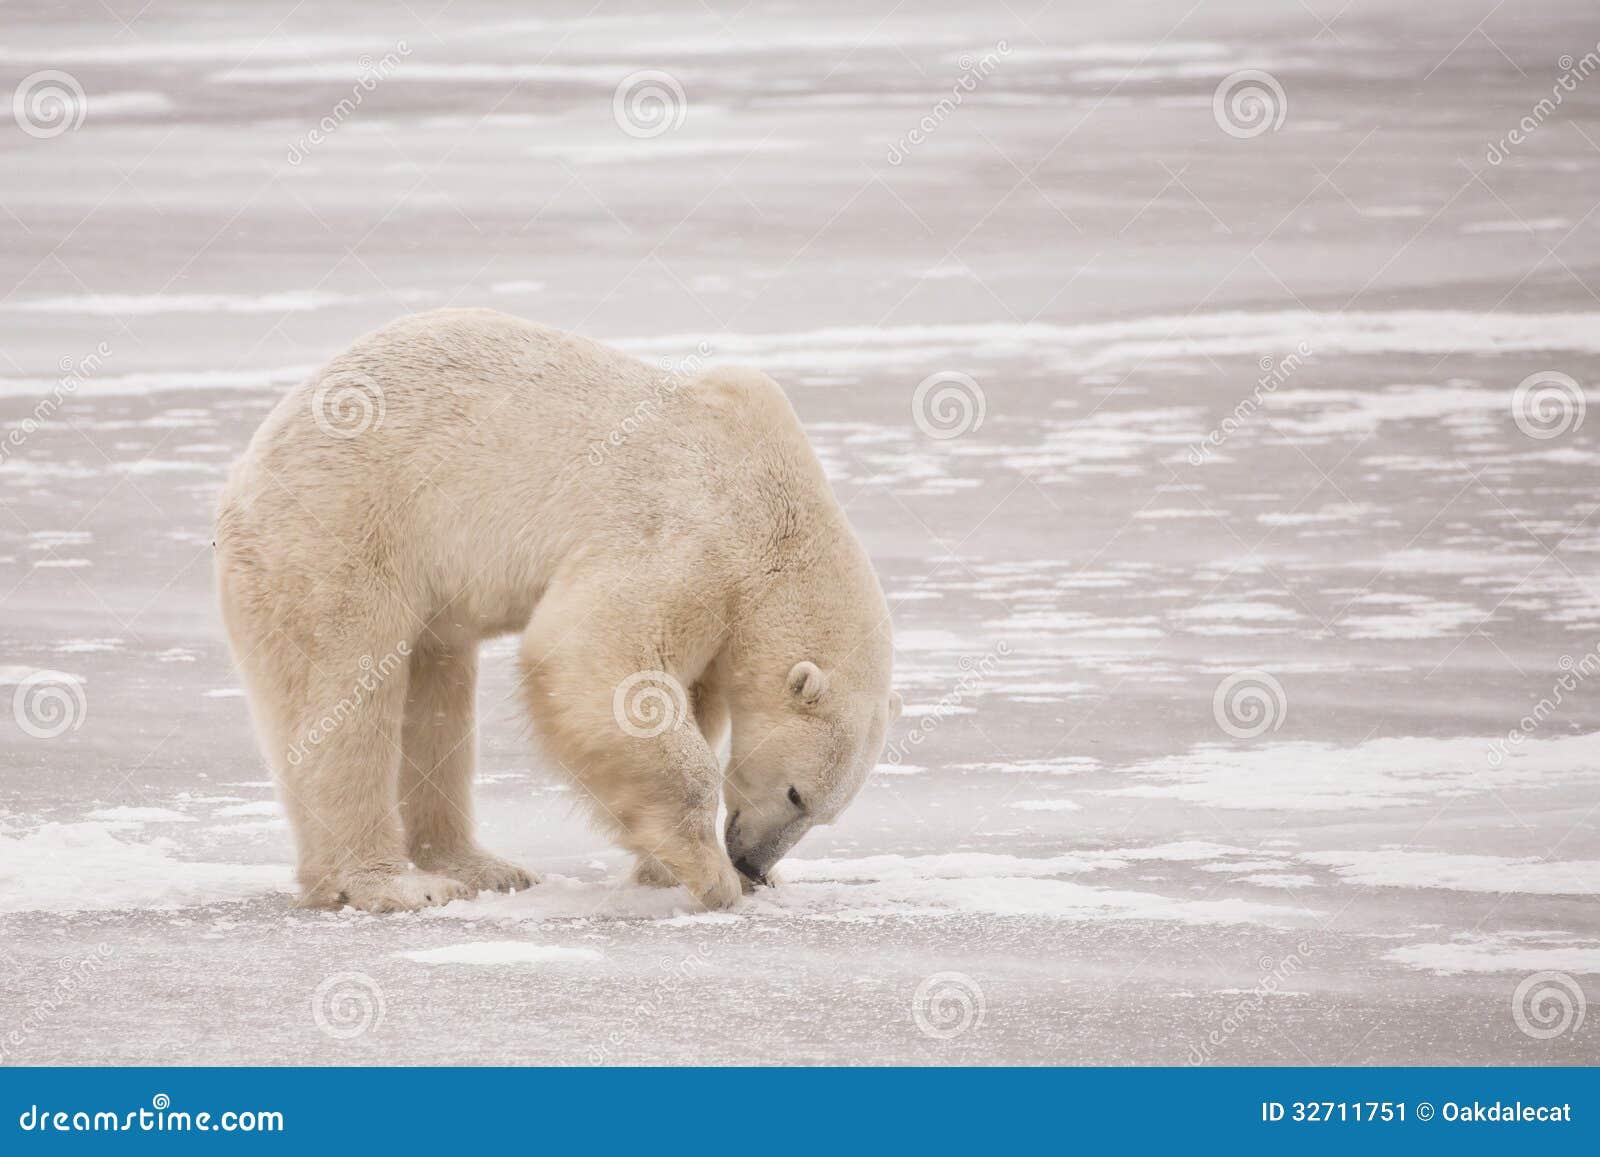 polar bear digging for food on ice stock image image of. Black Bedroom Furniture Sets. Home Design Ideas